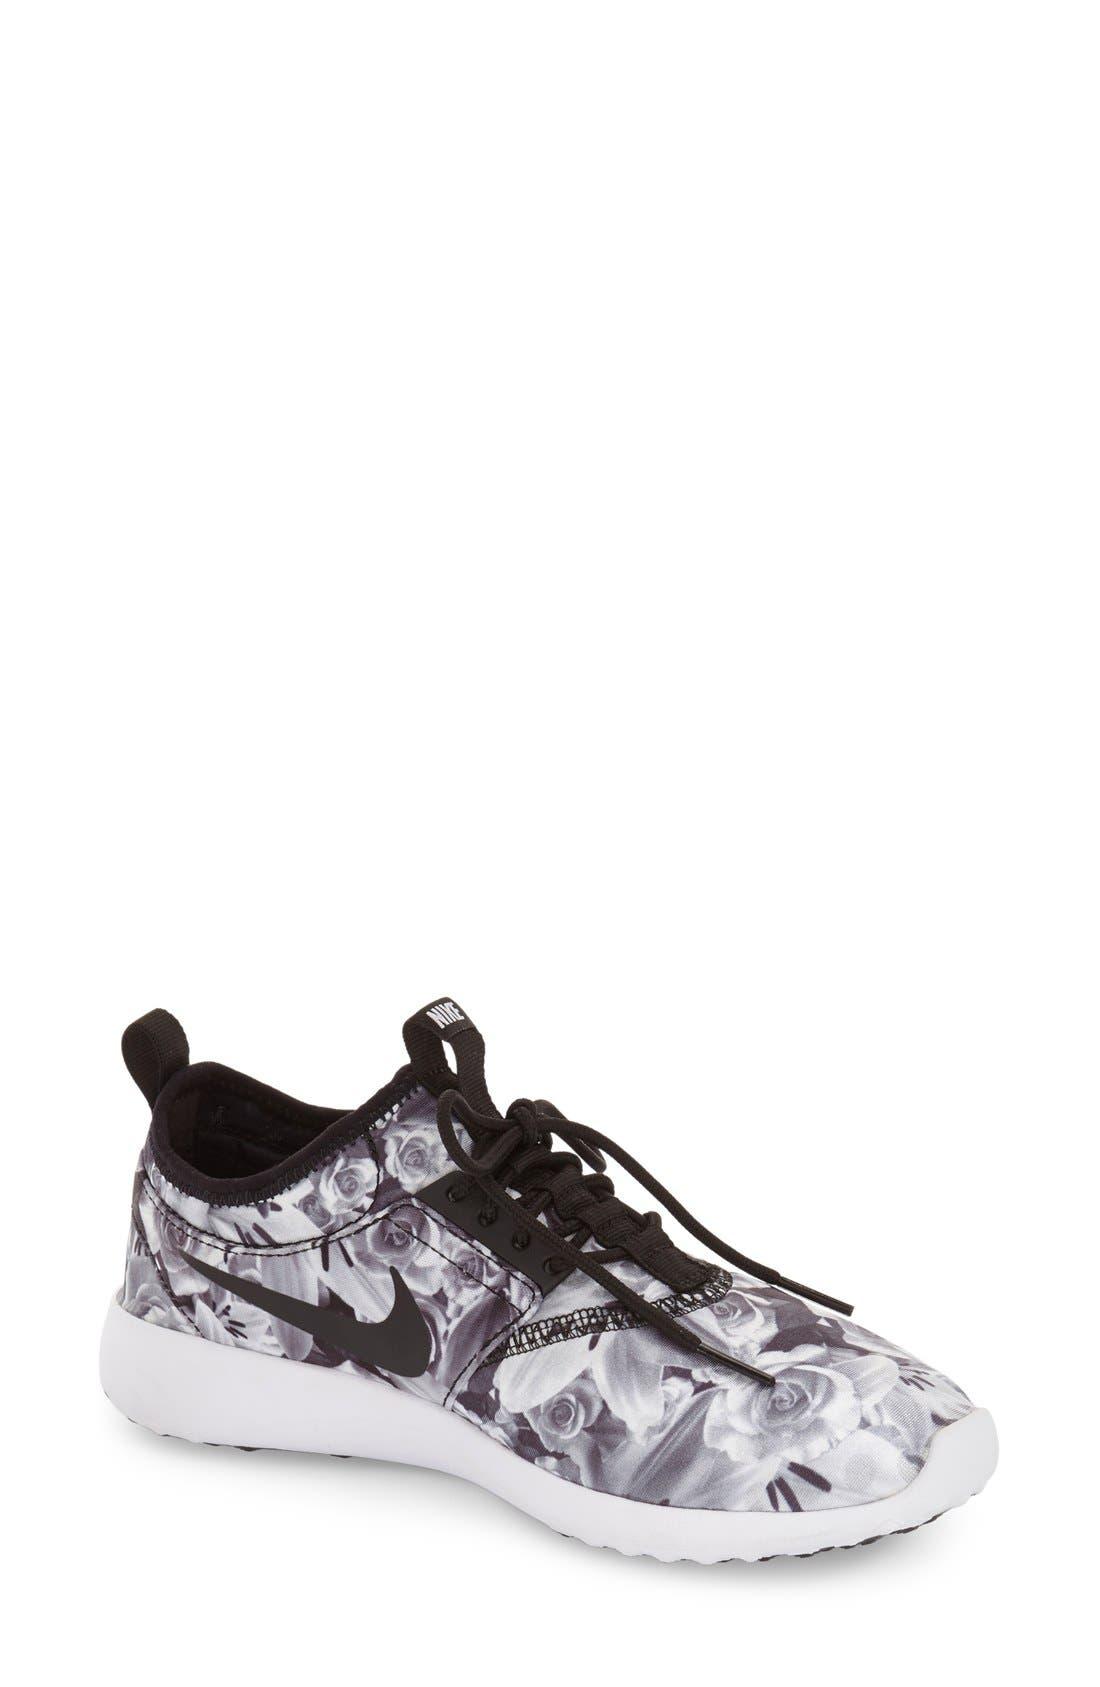 Juvenate Sneaker,                         Main,                         color, Black/ Black/ White